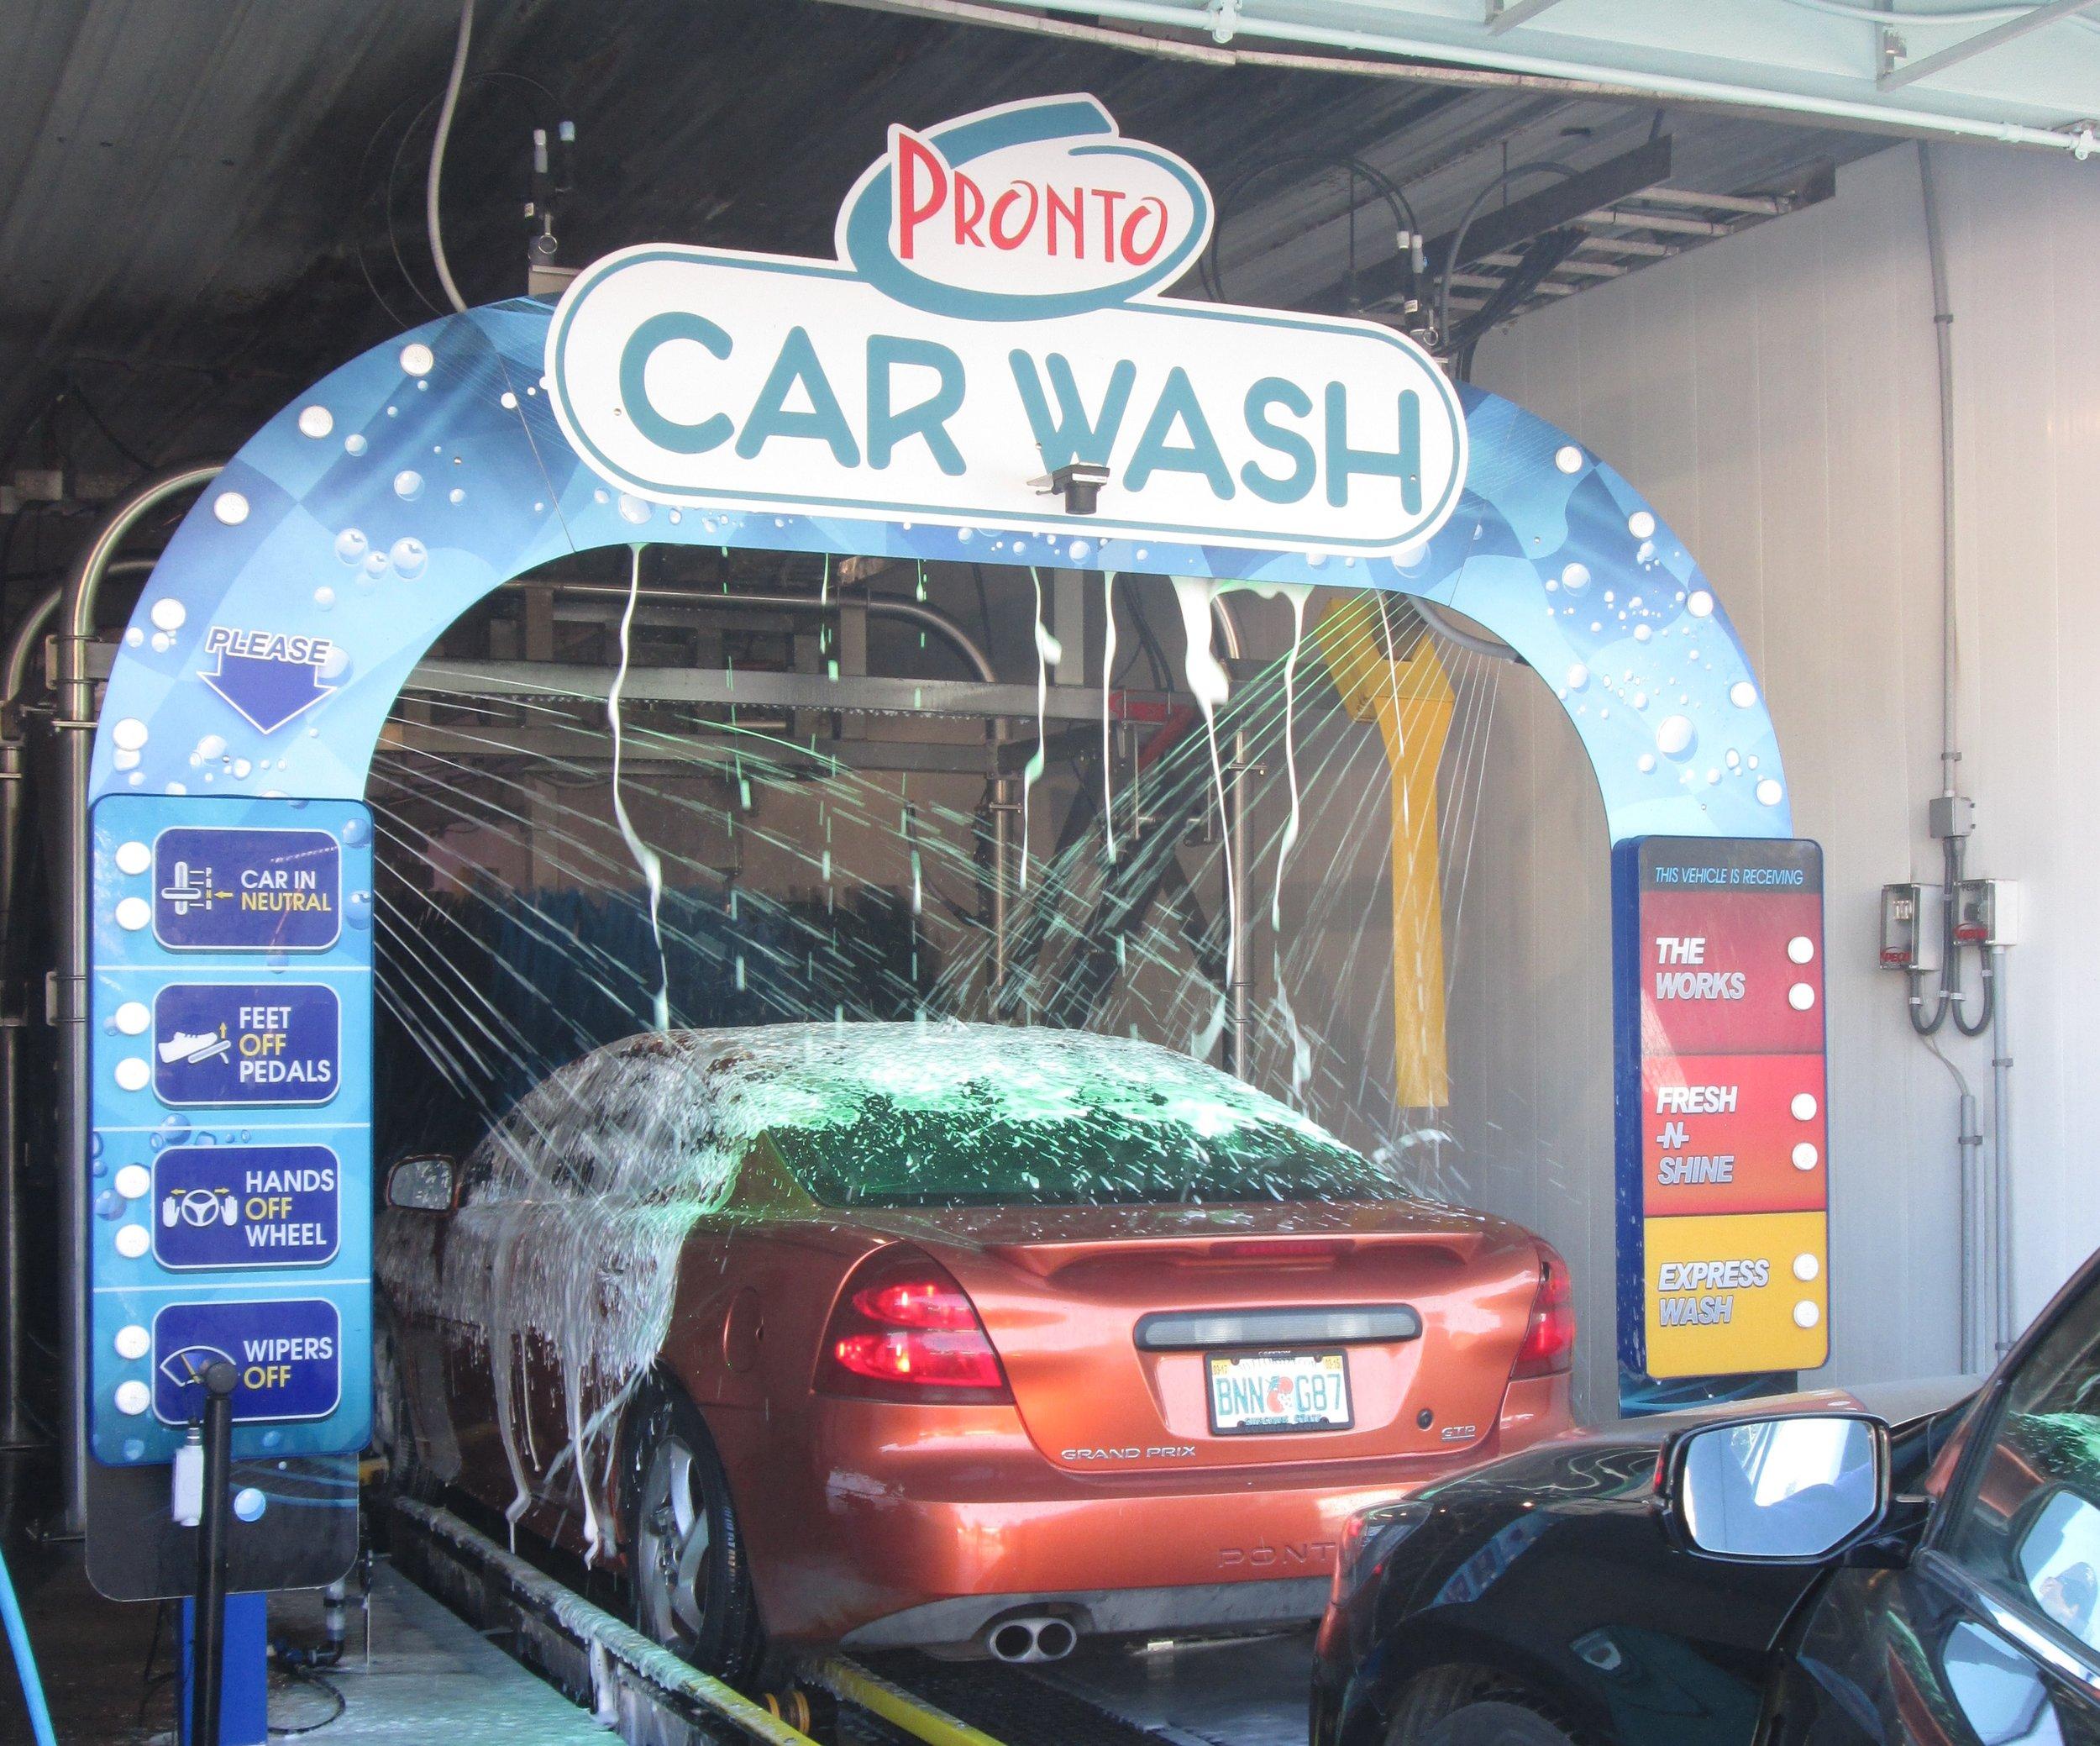 Pronto Express Wash